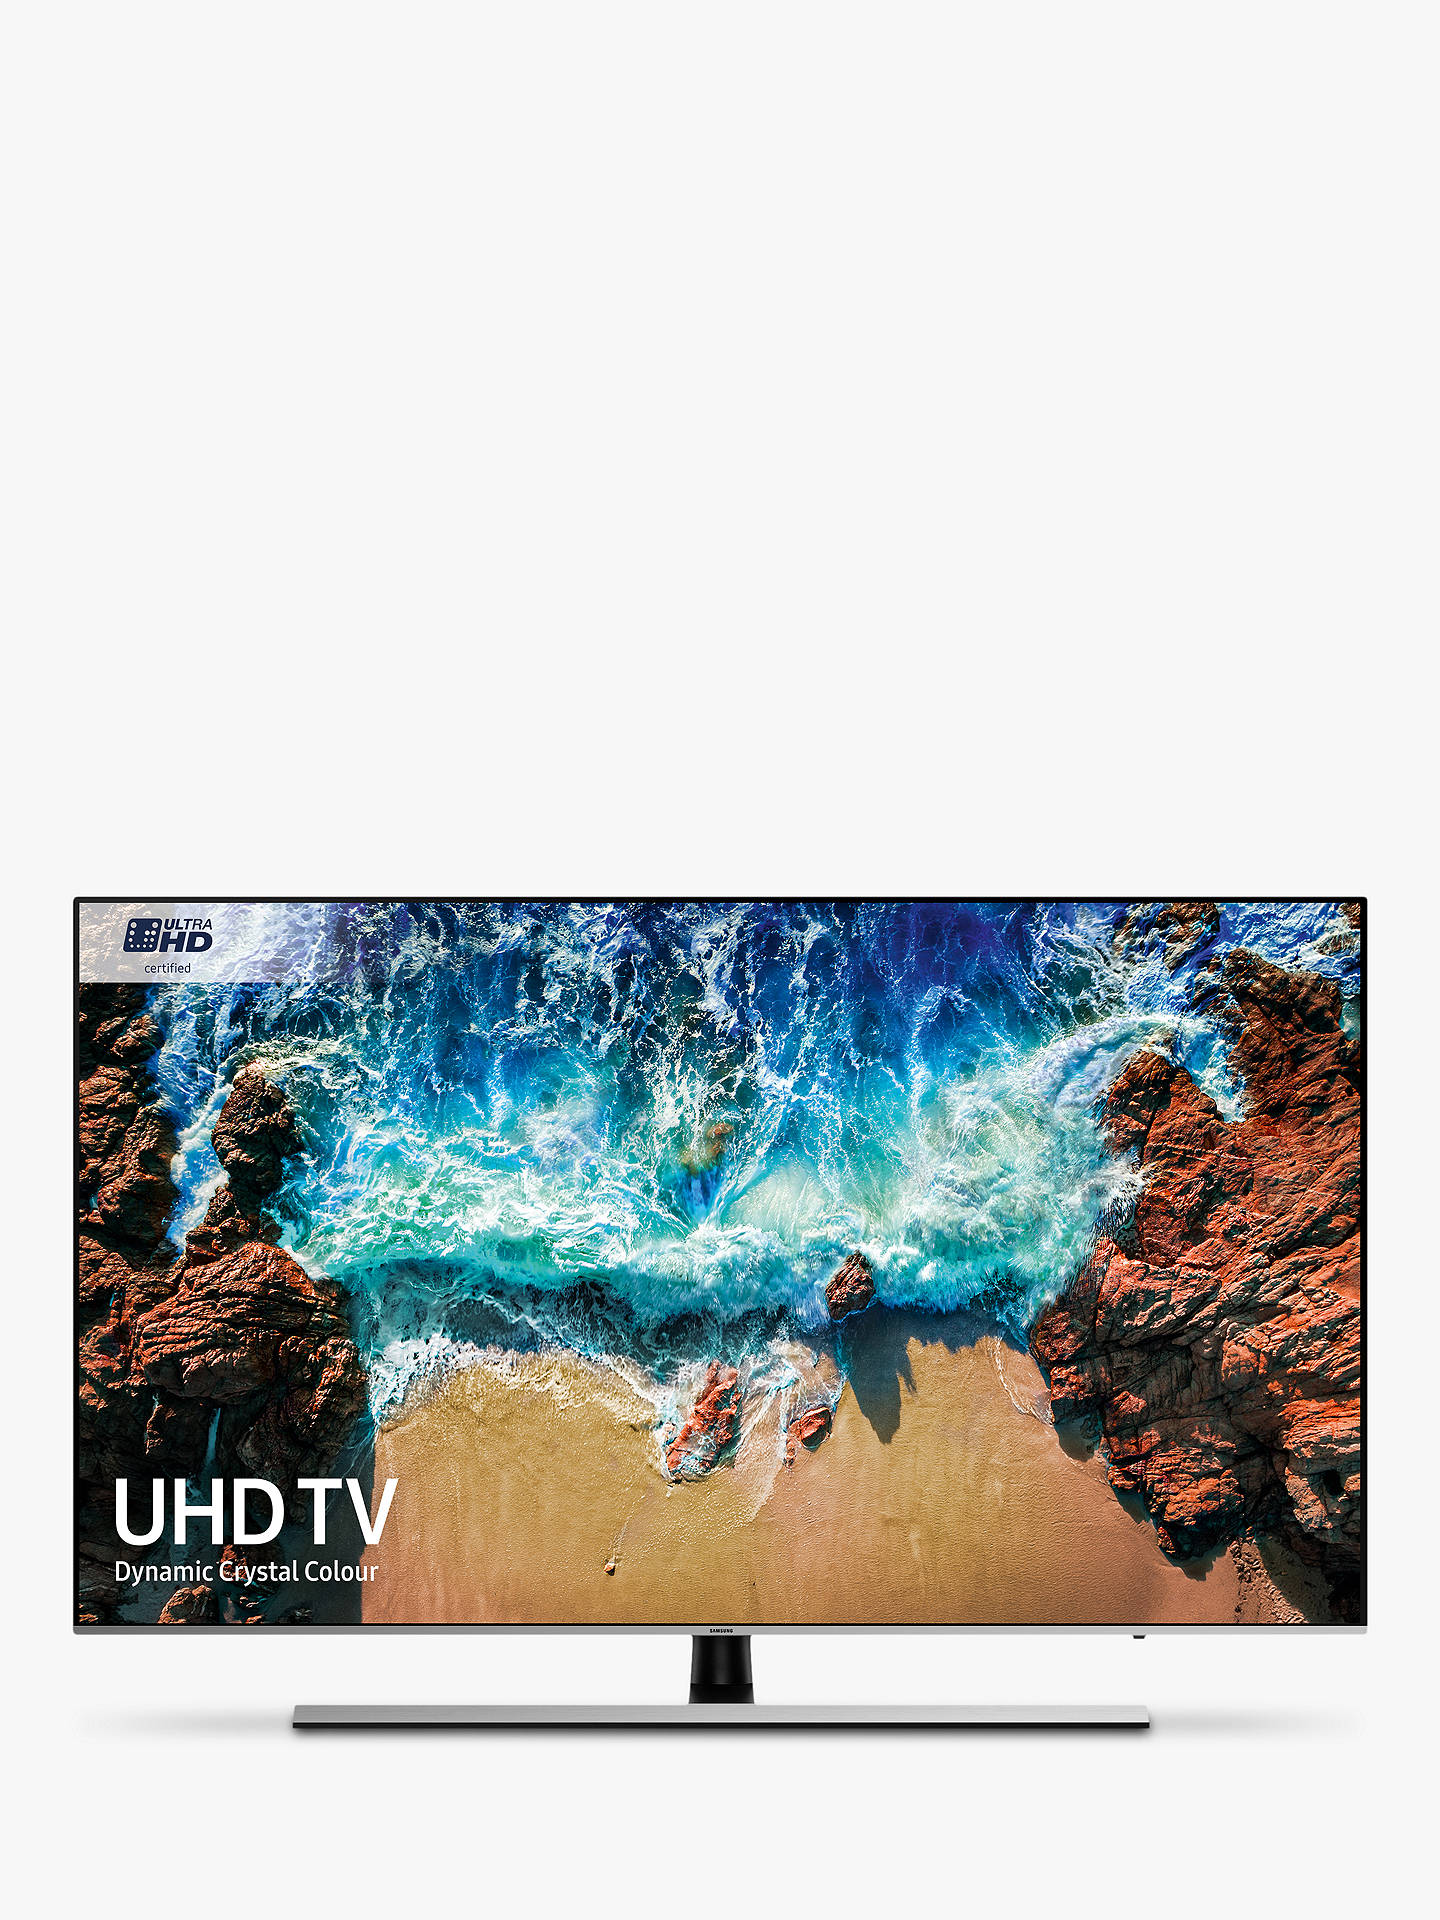 Samsung UE75NU8000 HDR Extreme 4K Ultra HD Smart TV, 75